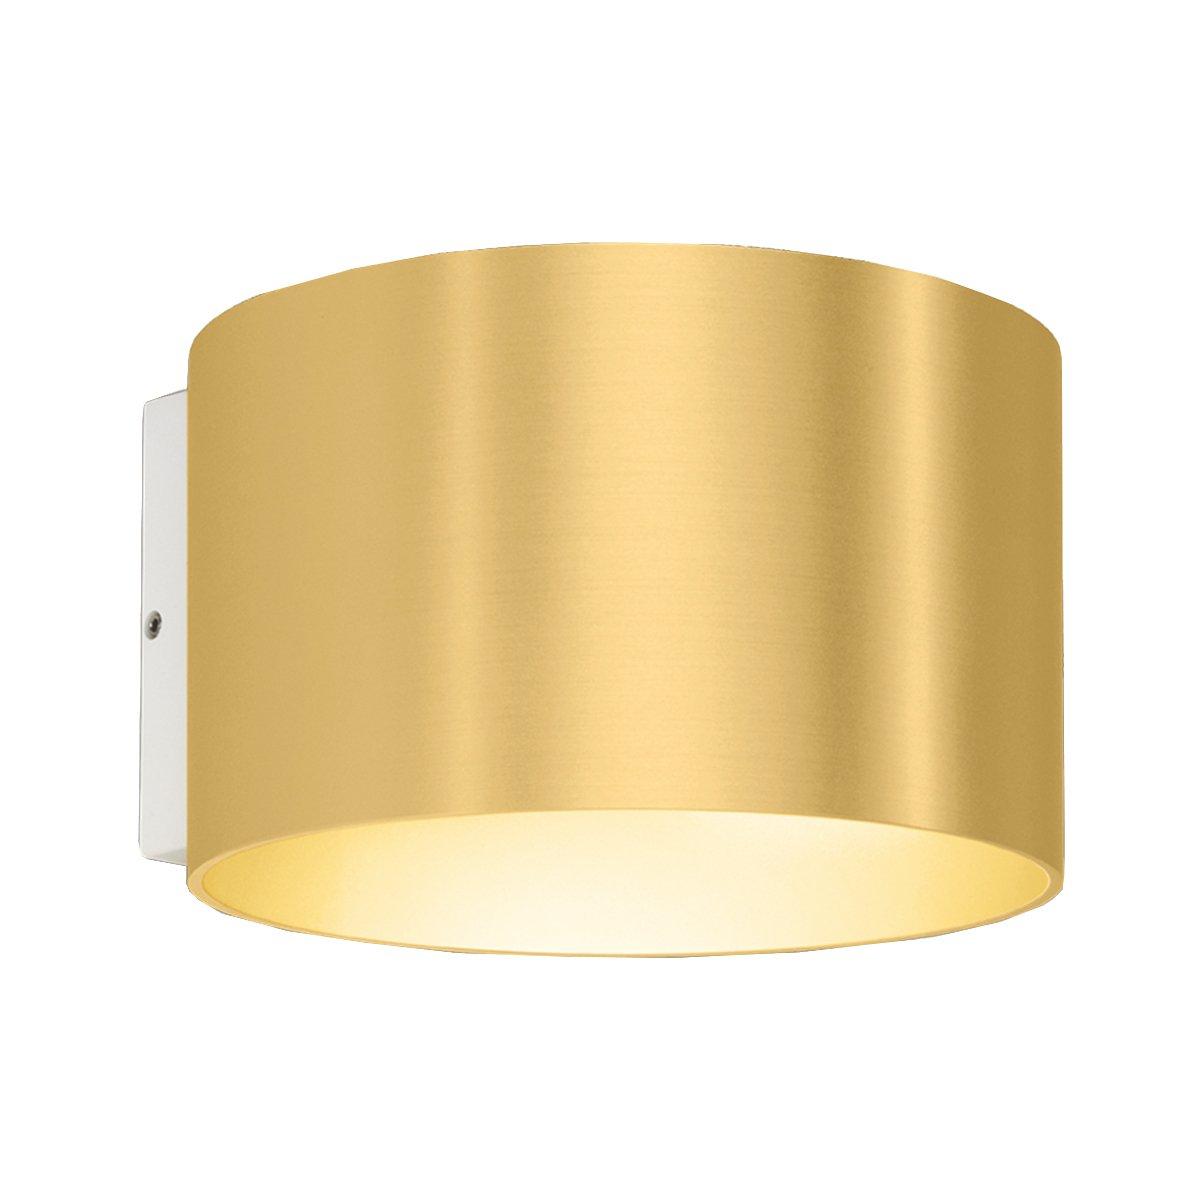 Wever & Ducr� Ray 1.0 G9 Wandlamp - Gold